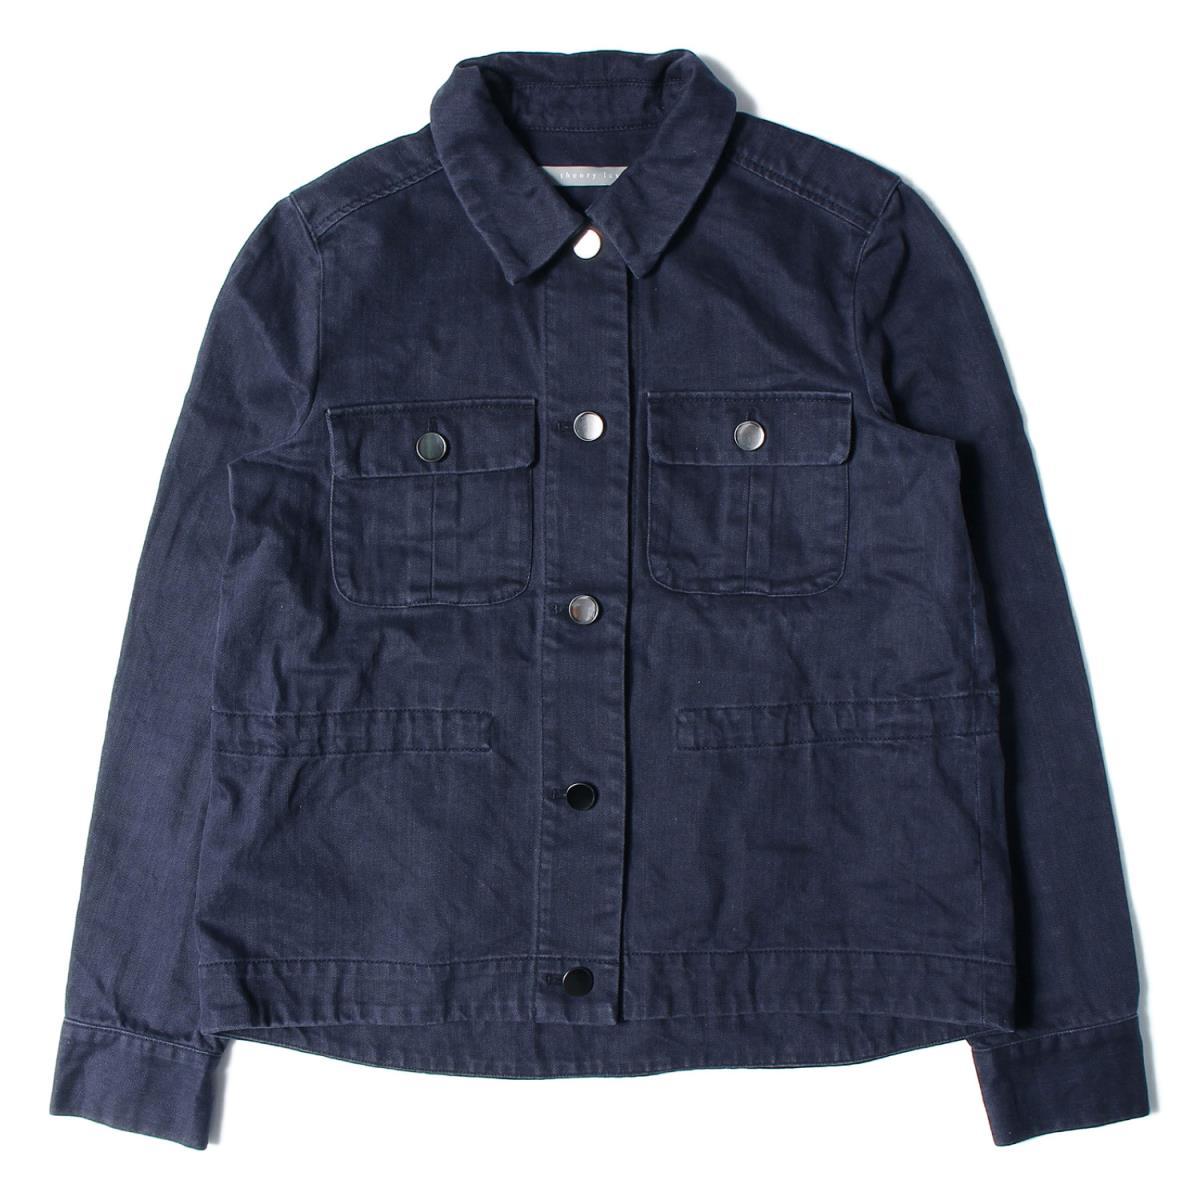 theory luxe(セオリーリュクス) Washed Twill Saske コットン ツイルジャケット 19春夏 ブラック 38(M) 【レディース】【中古】【美品】【K2308】